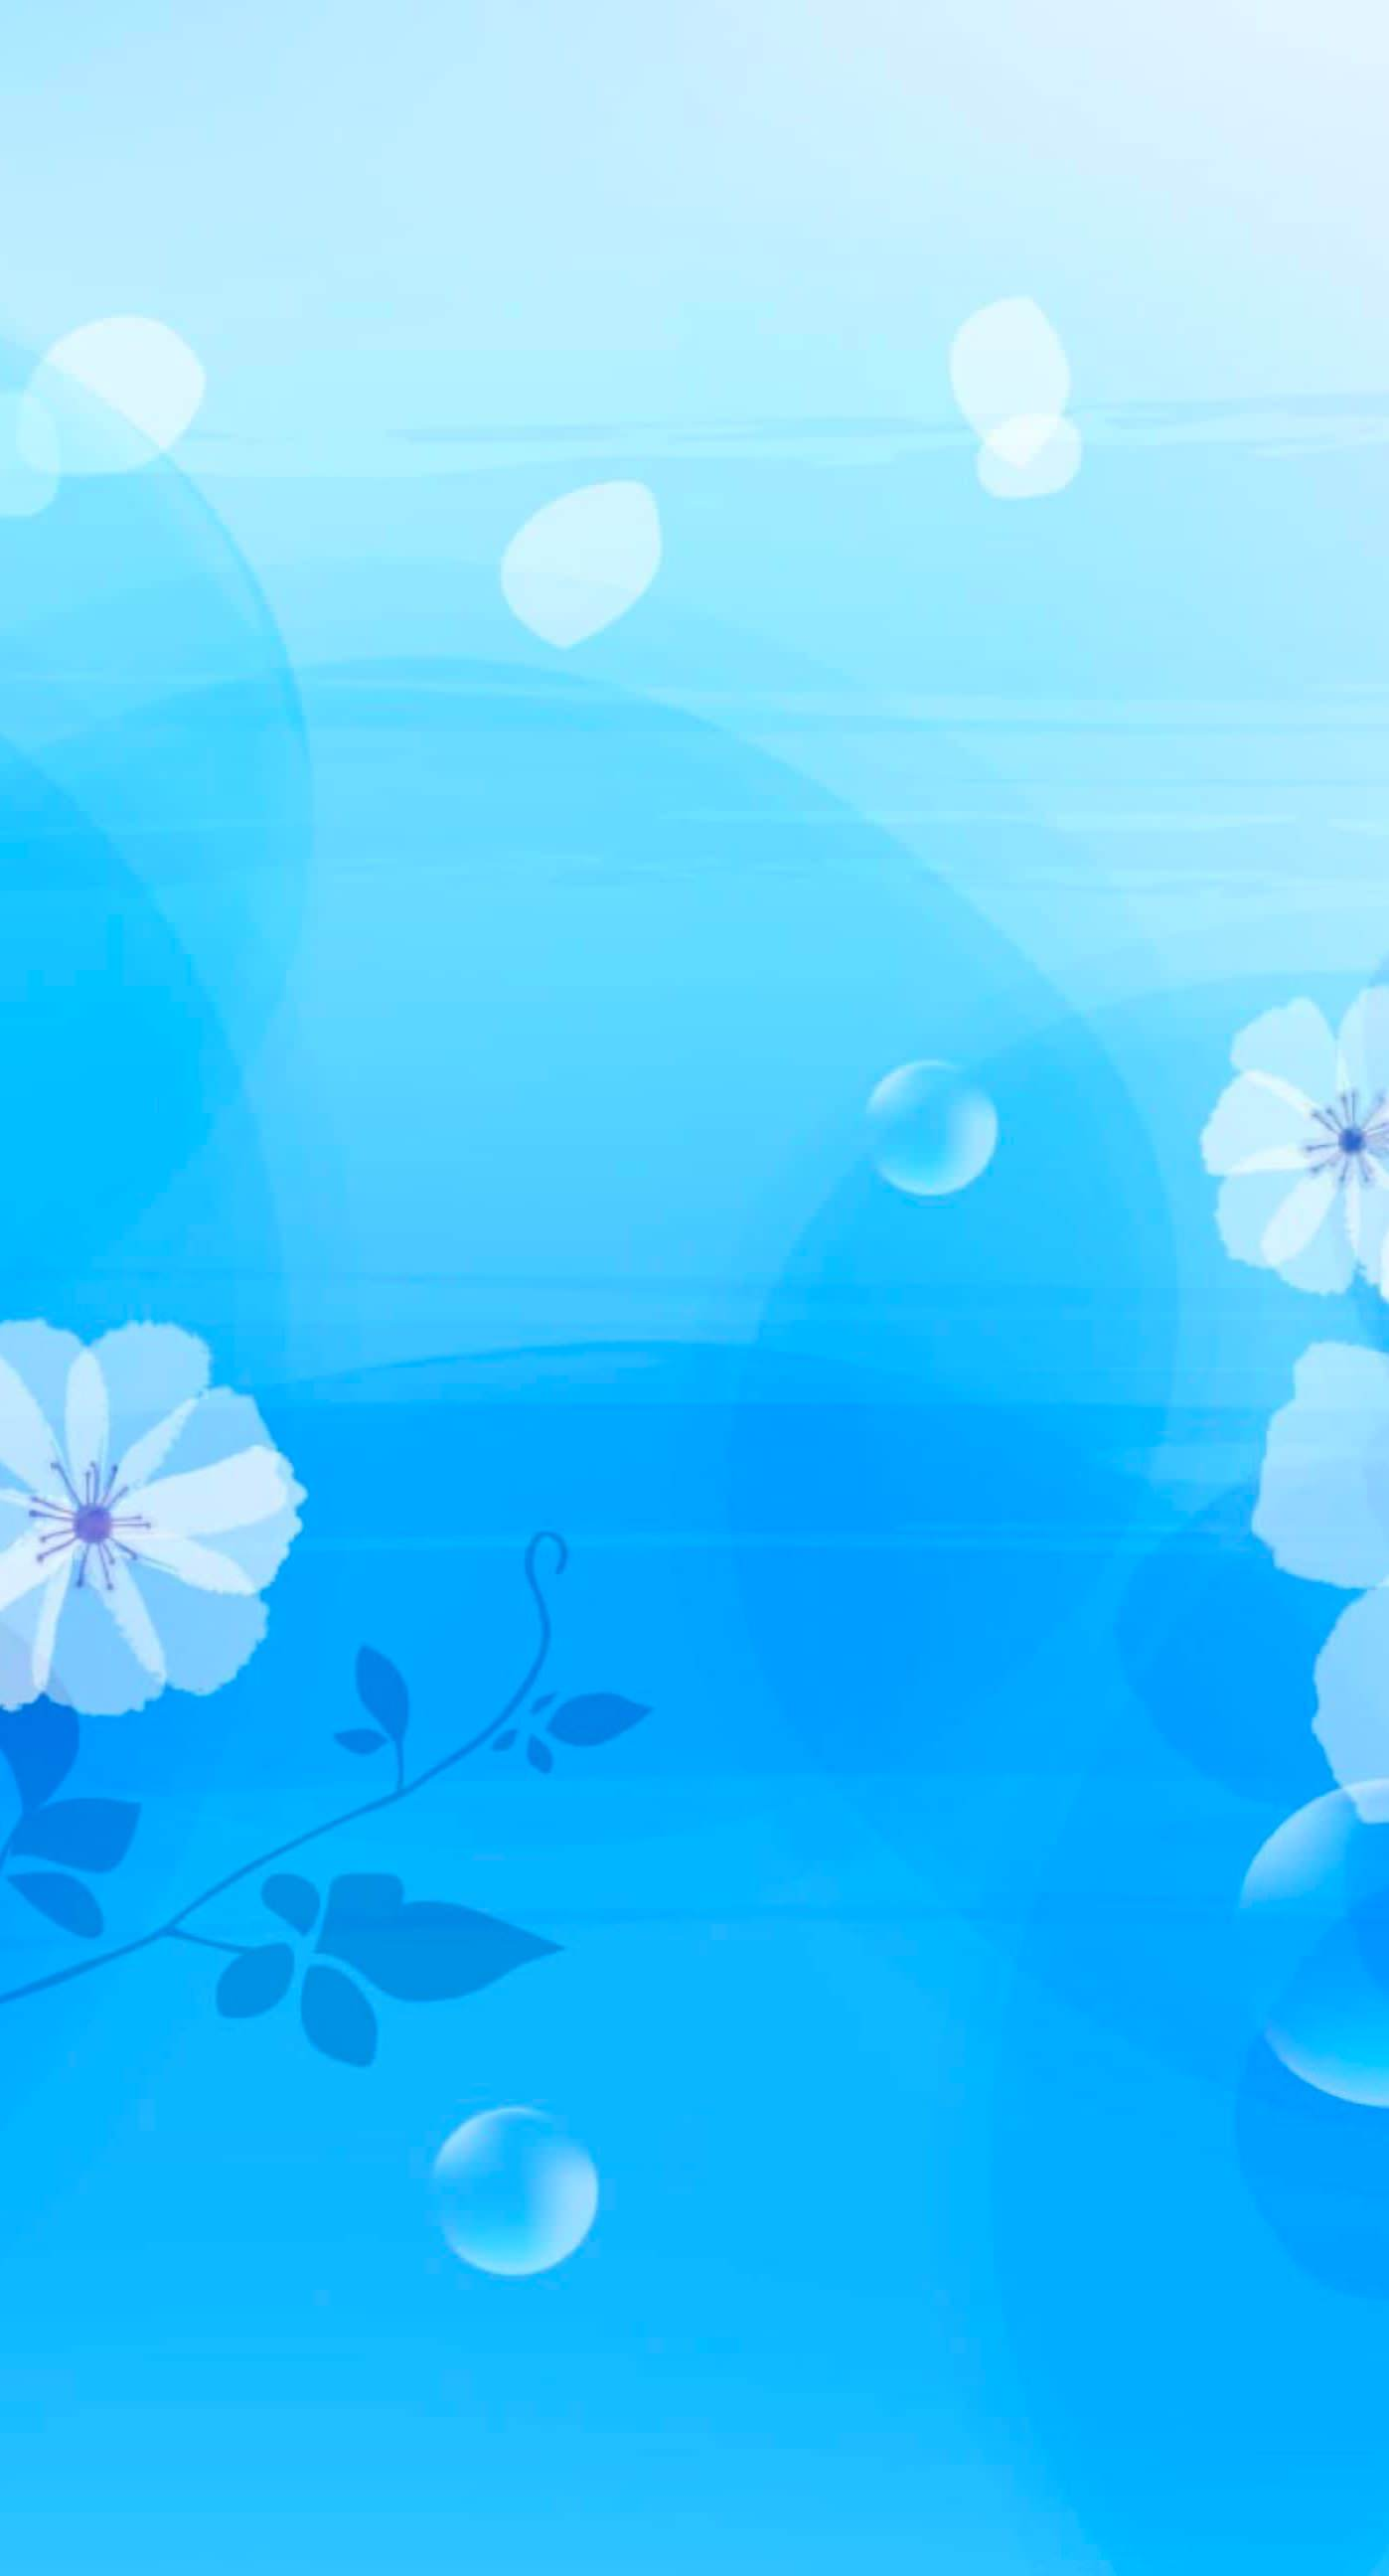 Unduh 3000 Wallpaper Biru Es HD